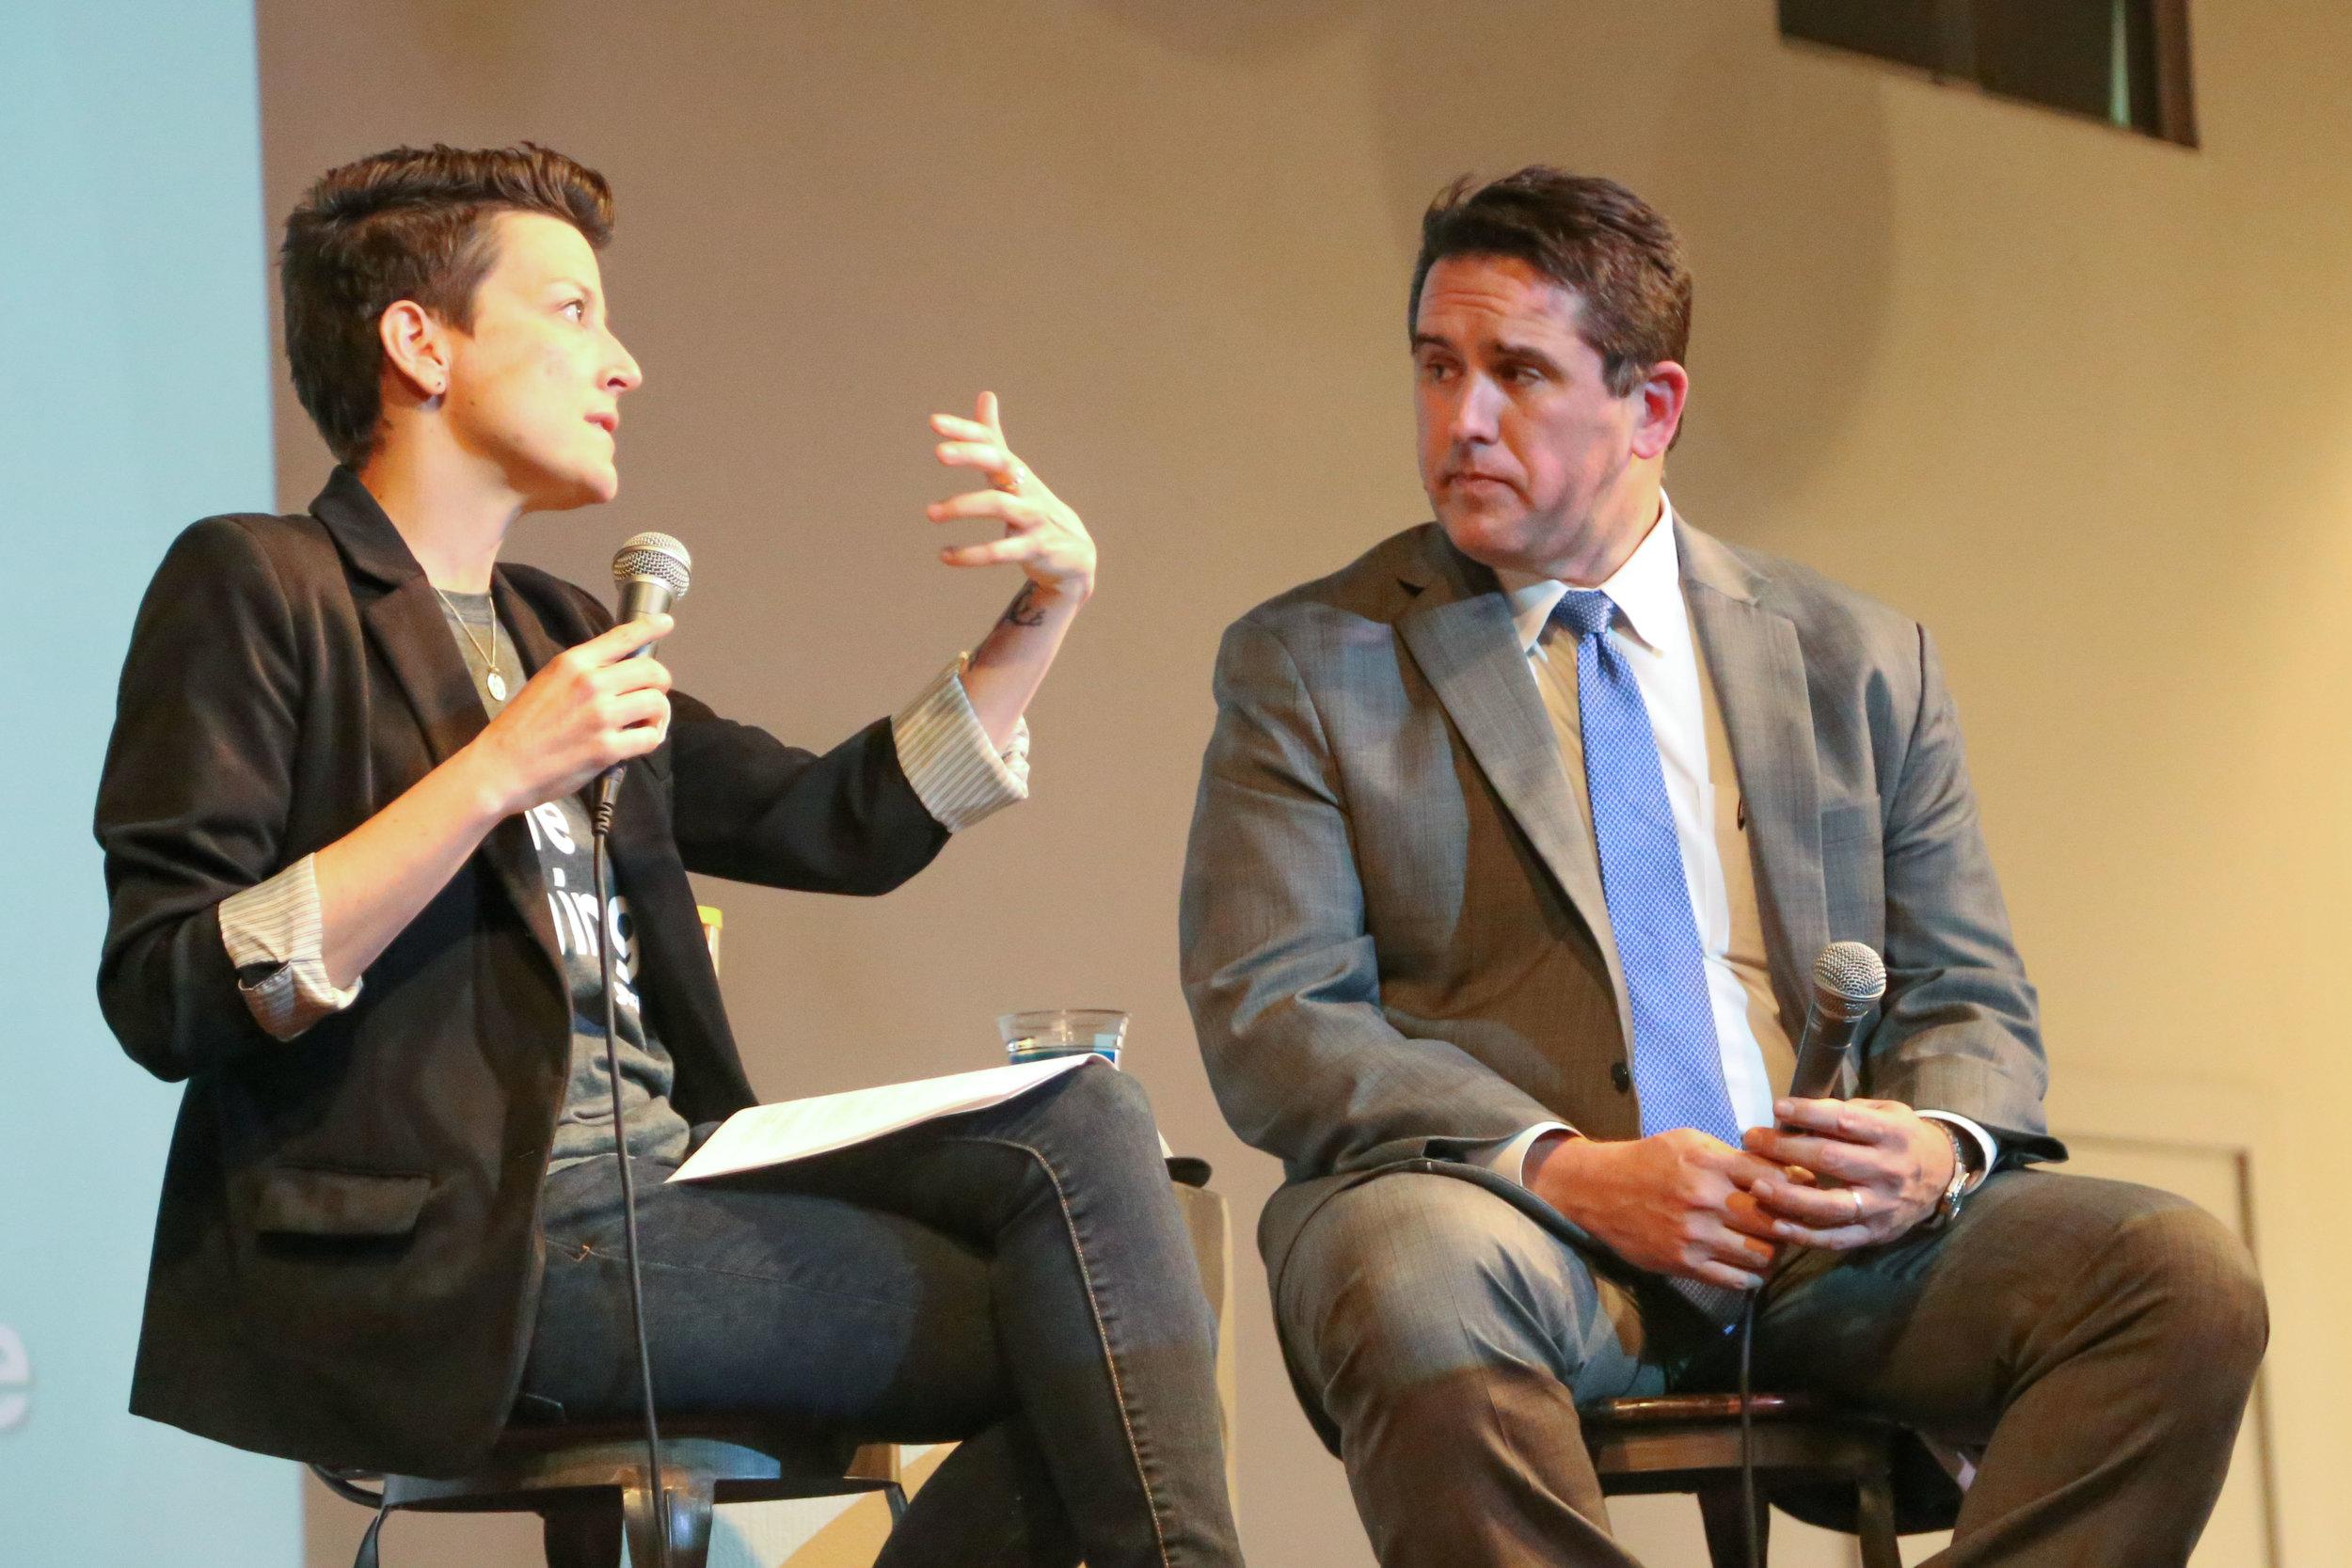 SA 2020 CEO Molly Cox interviews City Manager Eric Walsh. (Photos by:  GA Media Media Productions .)